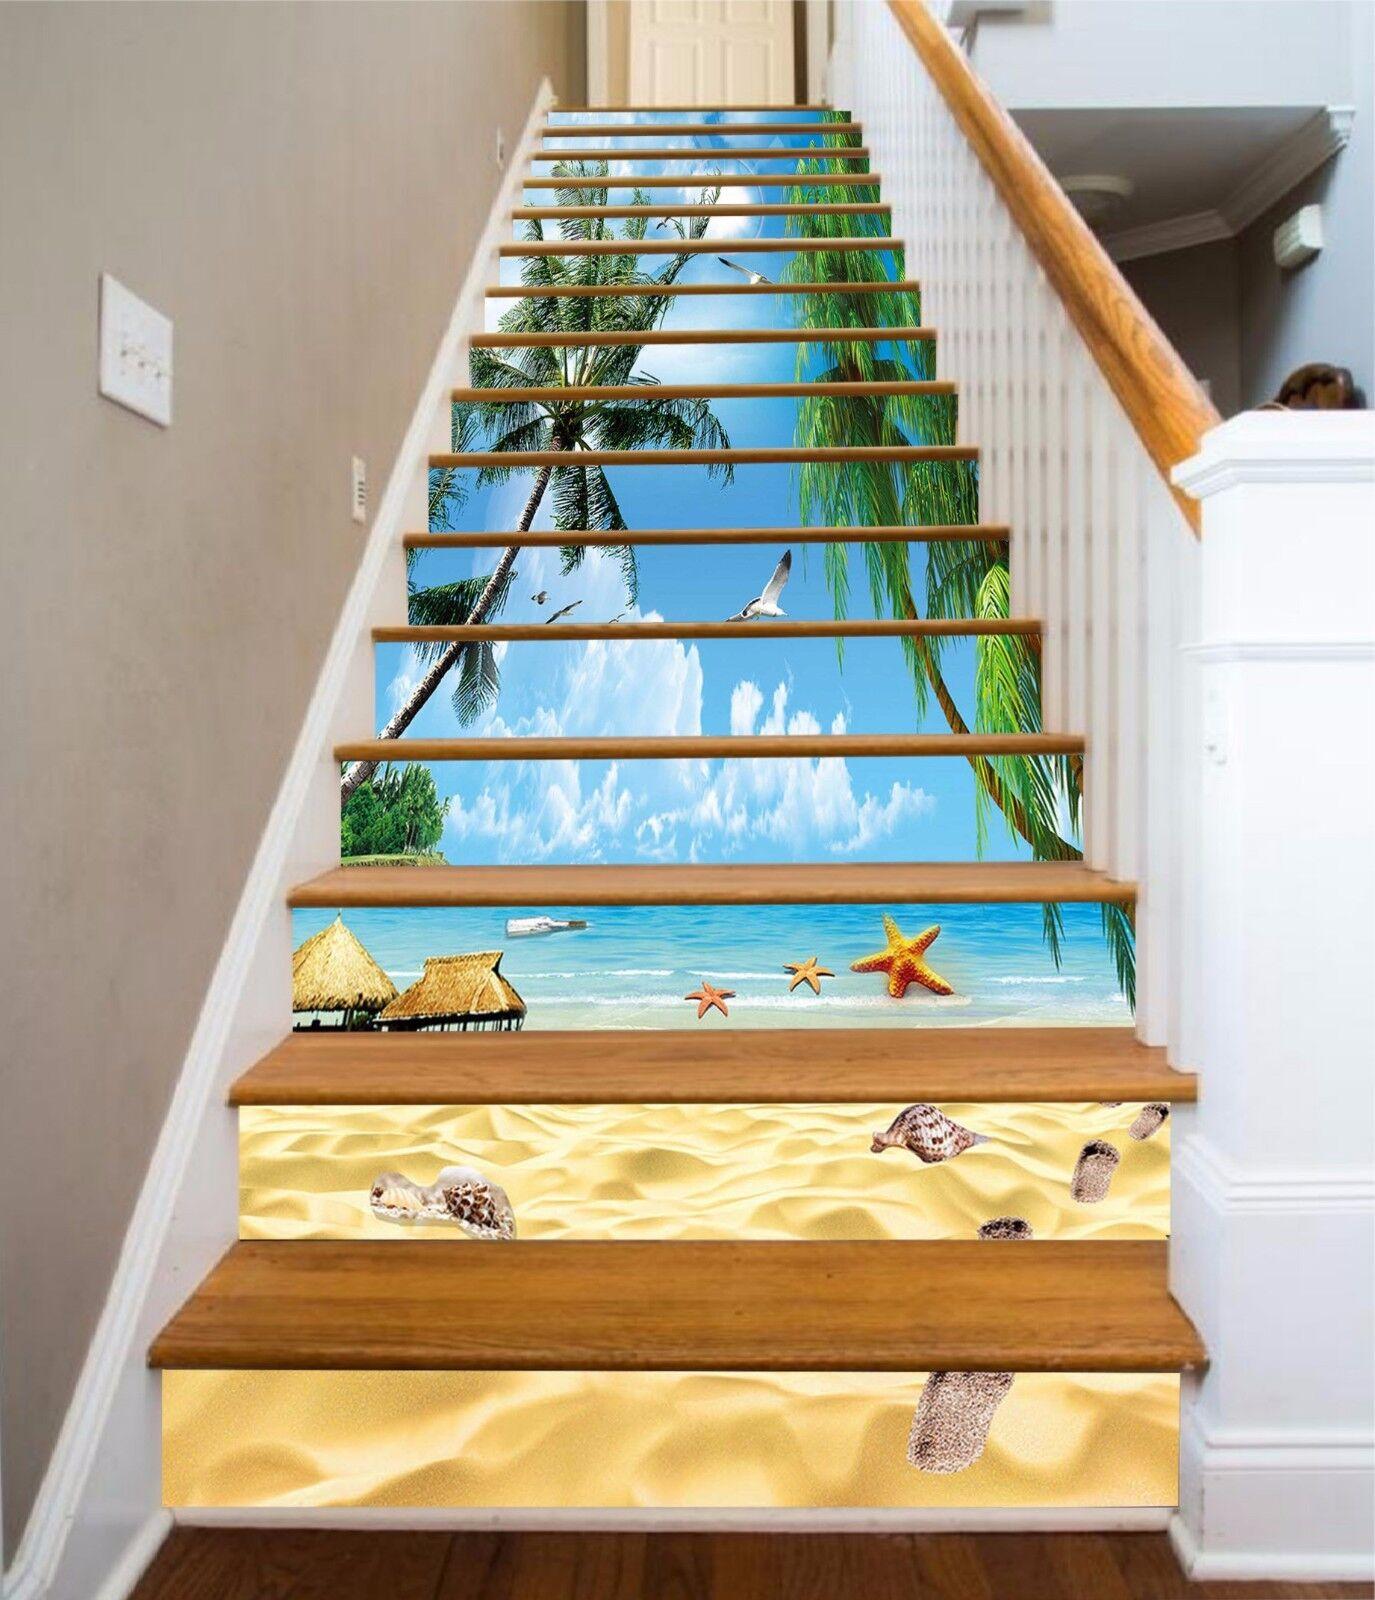 3D Seaside Beach 84 Stair Risers Decoration Photo Mural Vinyl Decal Wallpaper AU